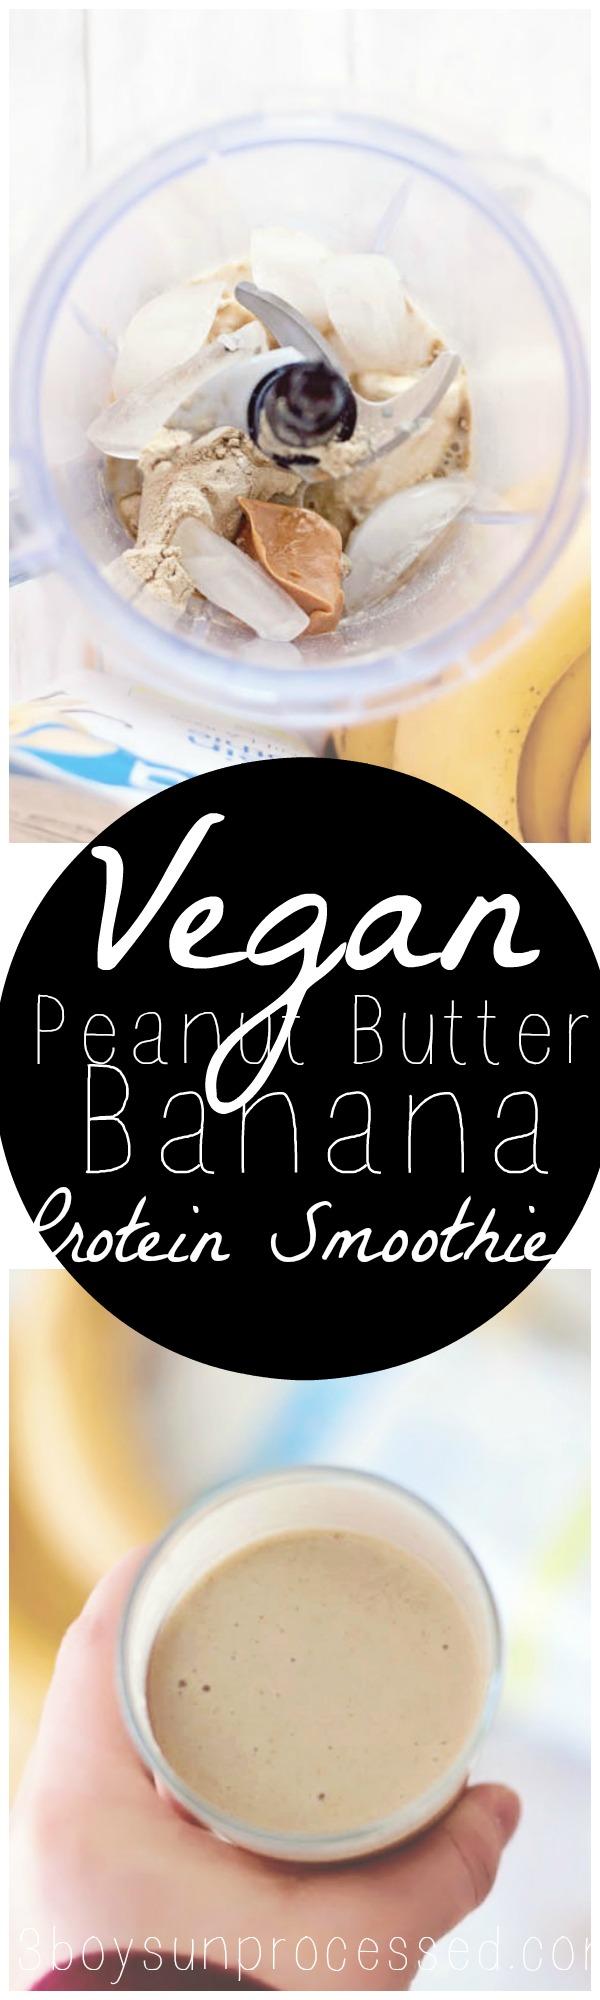 Vegan Peanut Butter Banana Protein Smoothie